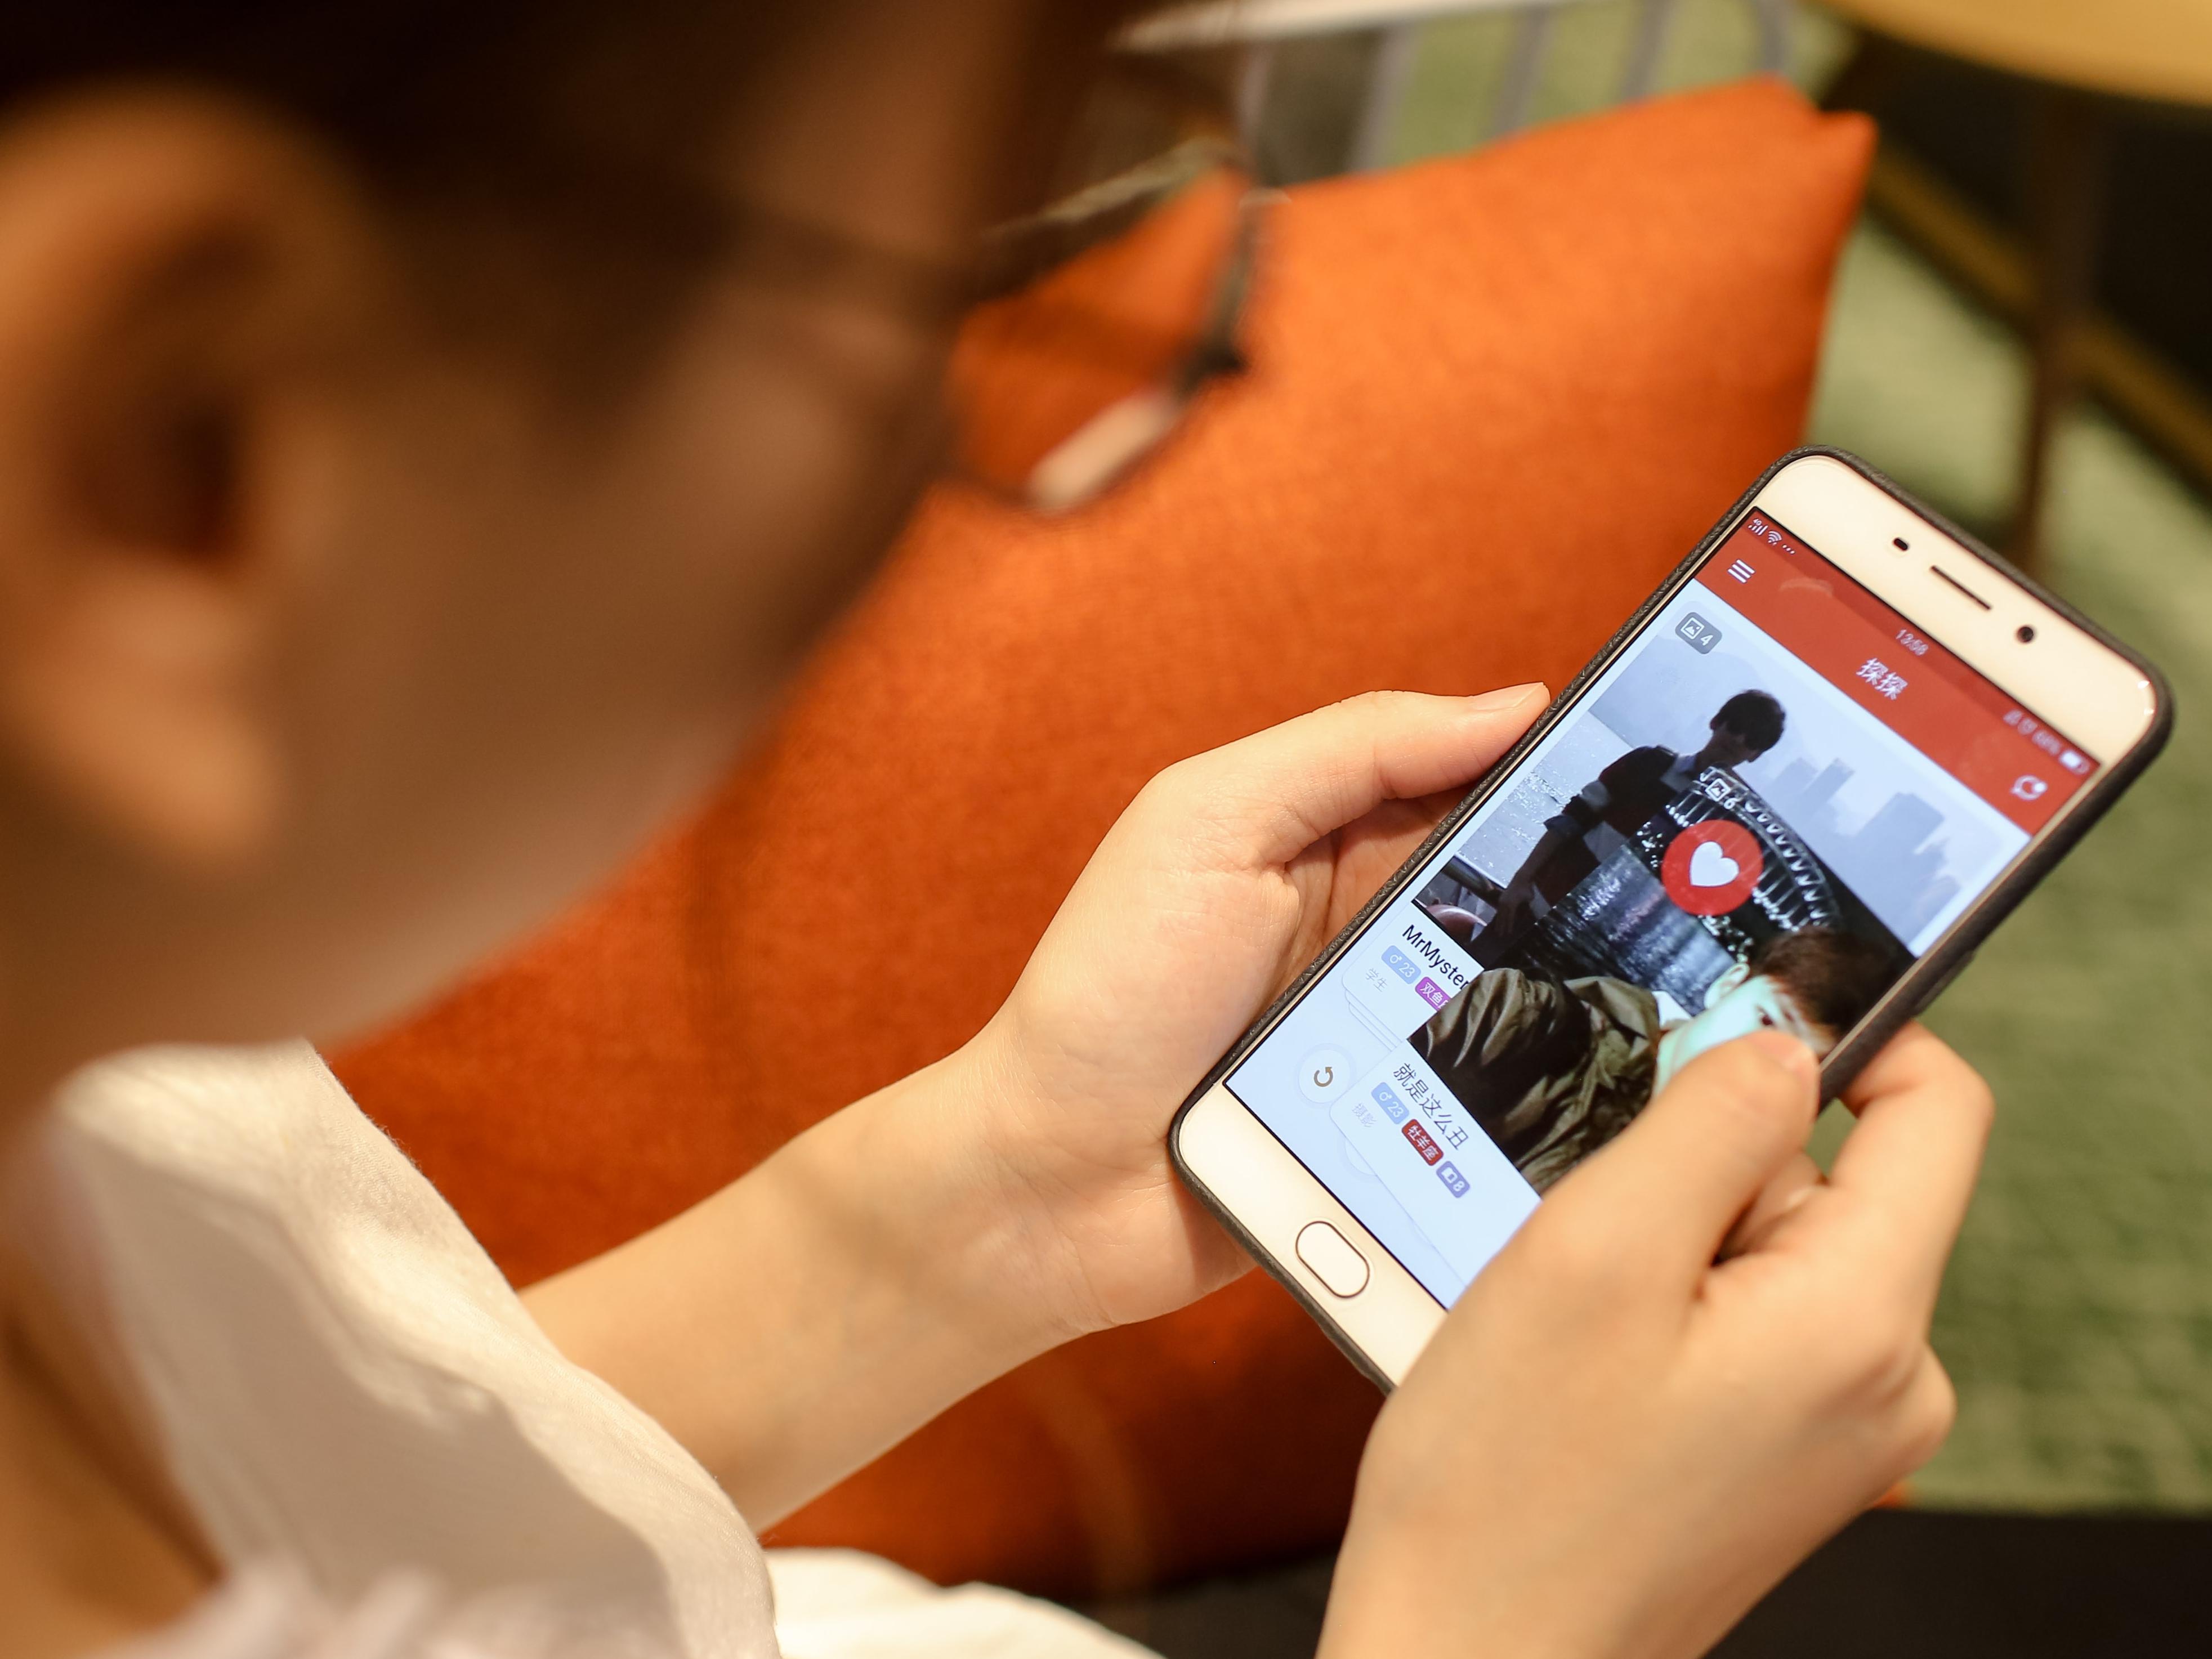 Download . hookup games for china mobile